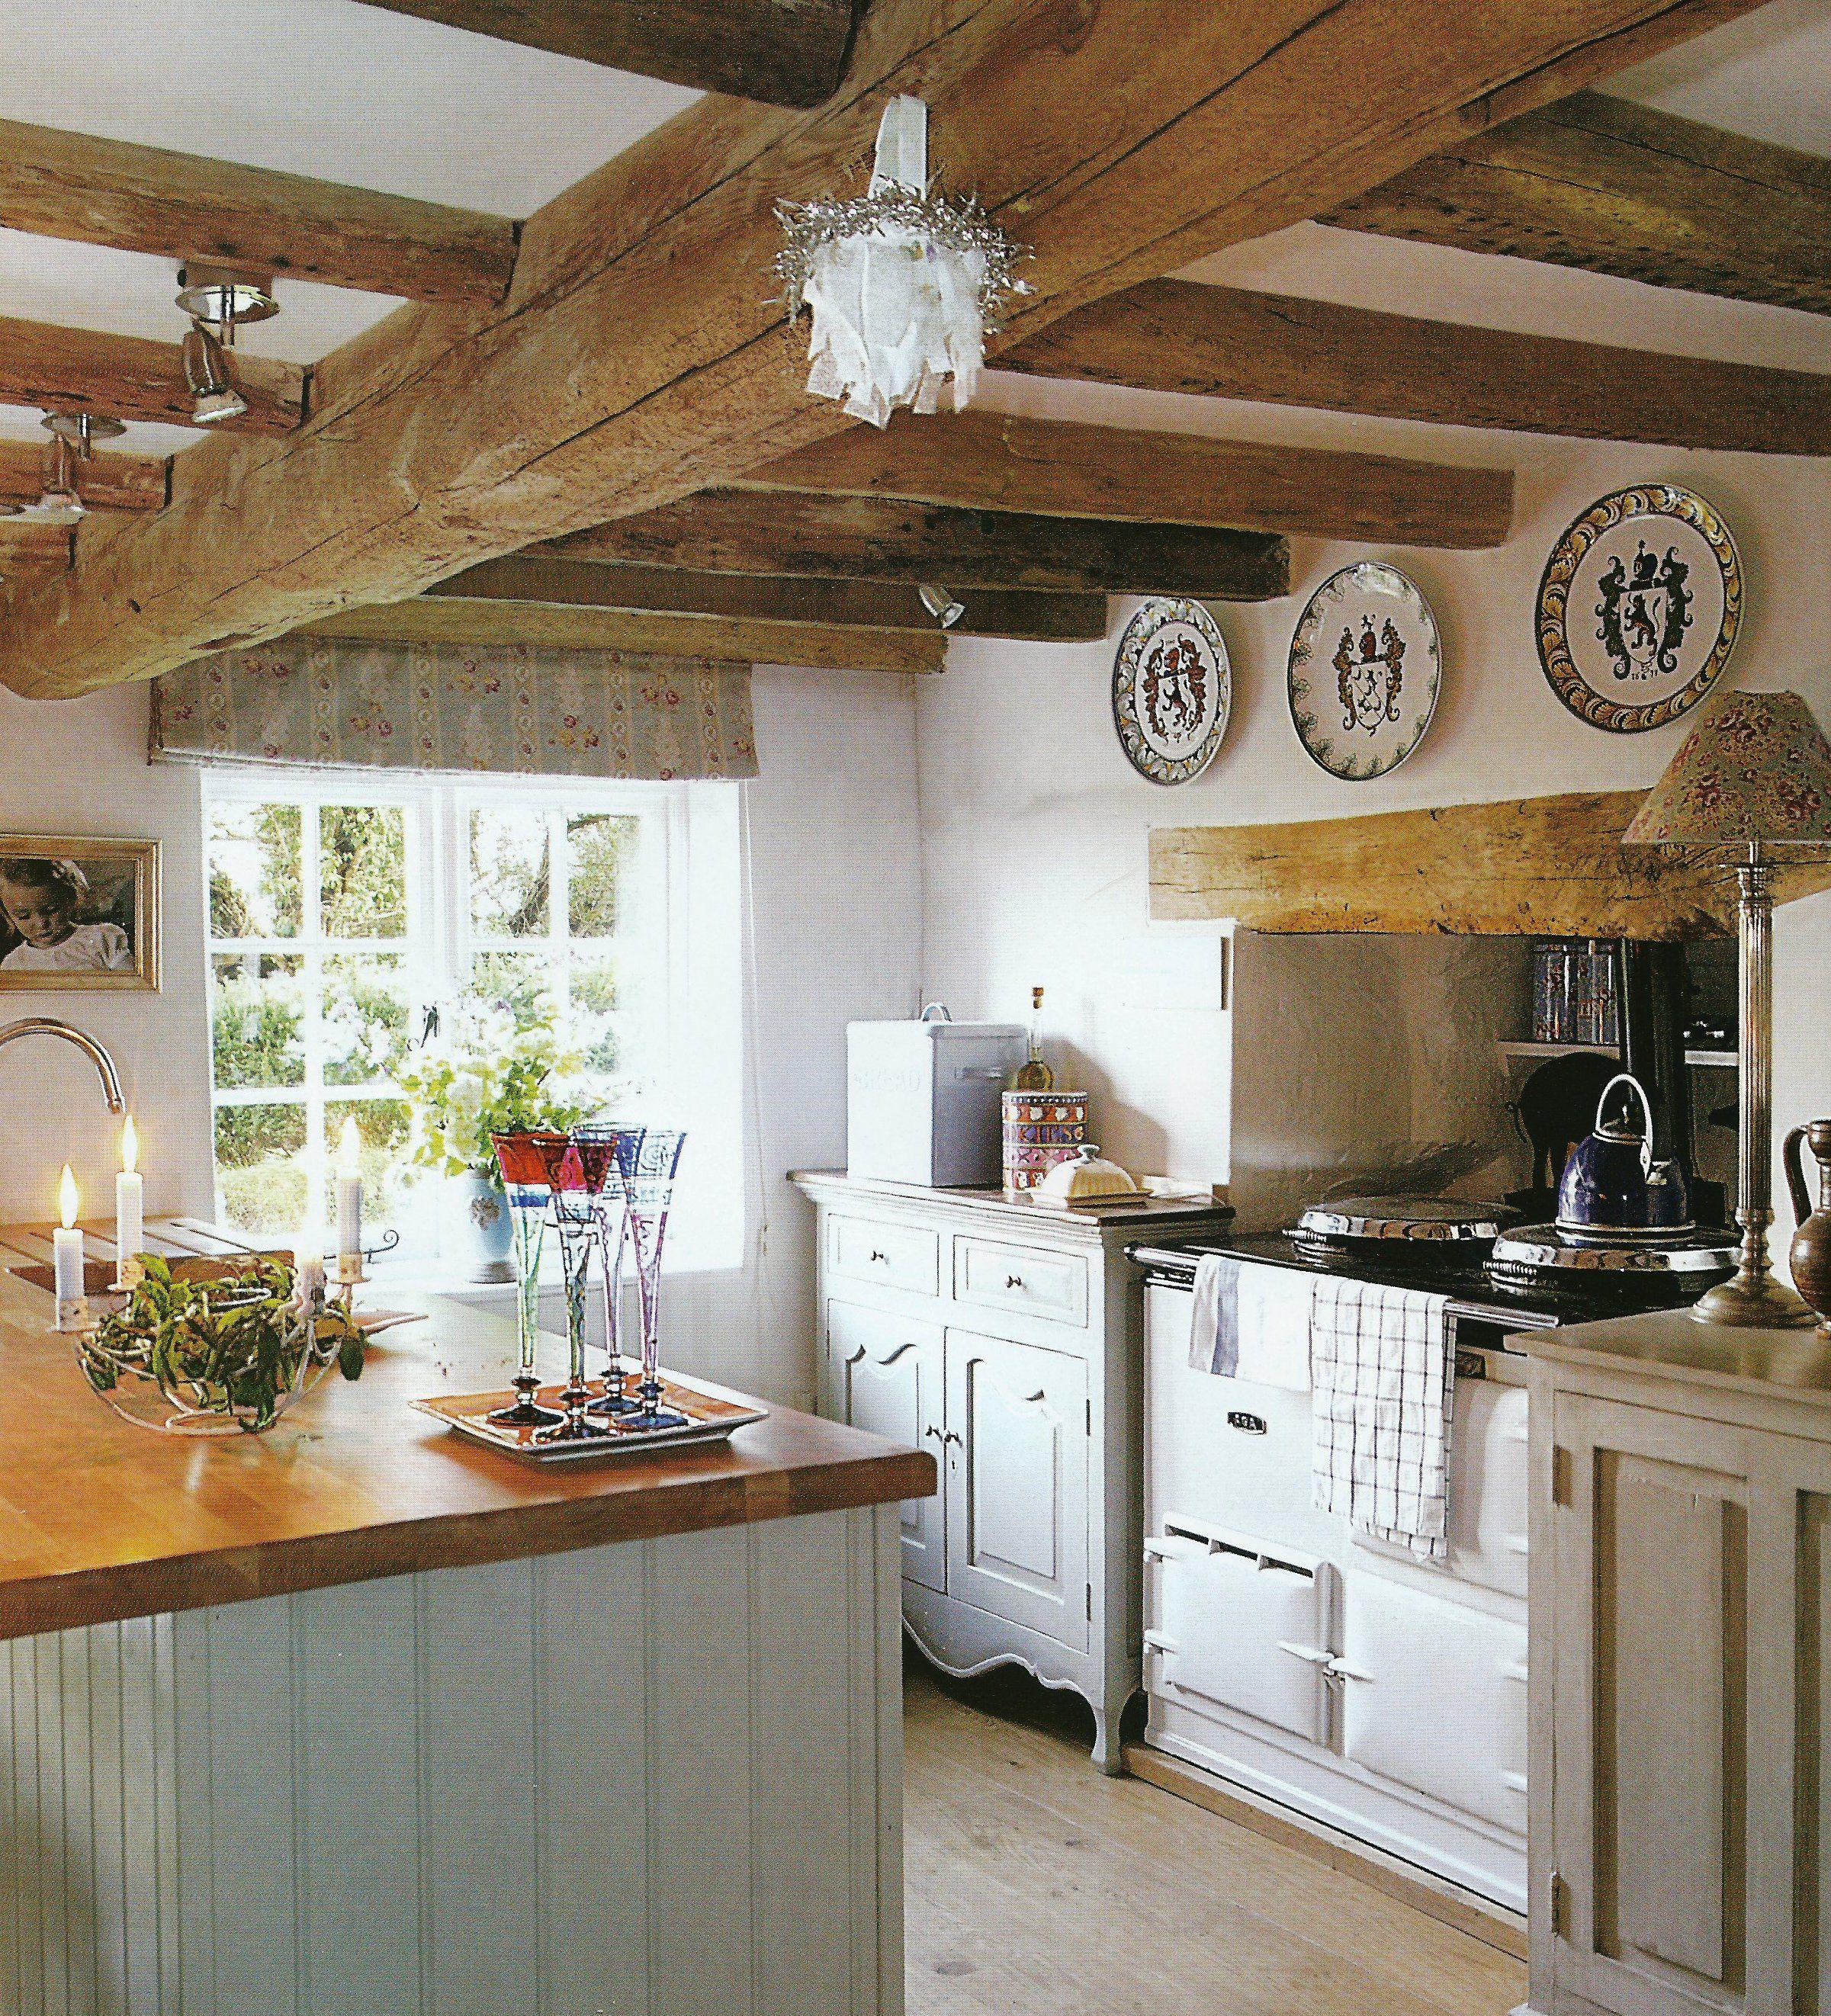 Such a gorgeous kitchen | Cocinas | Pinterest | Cocinas, Campo y De ...